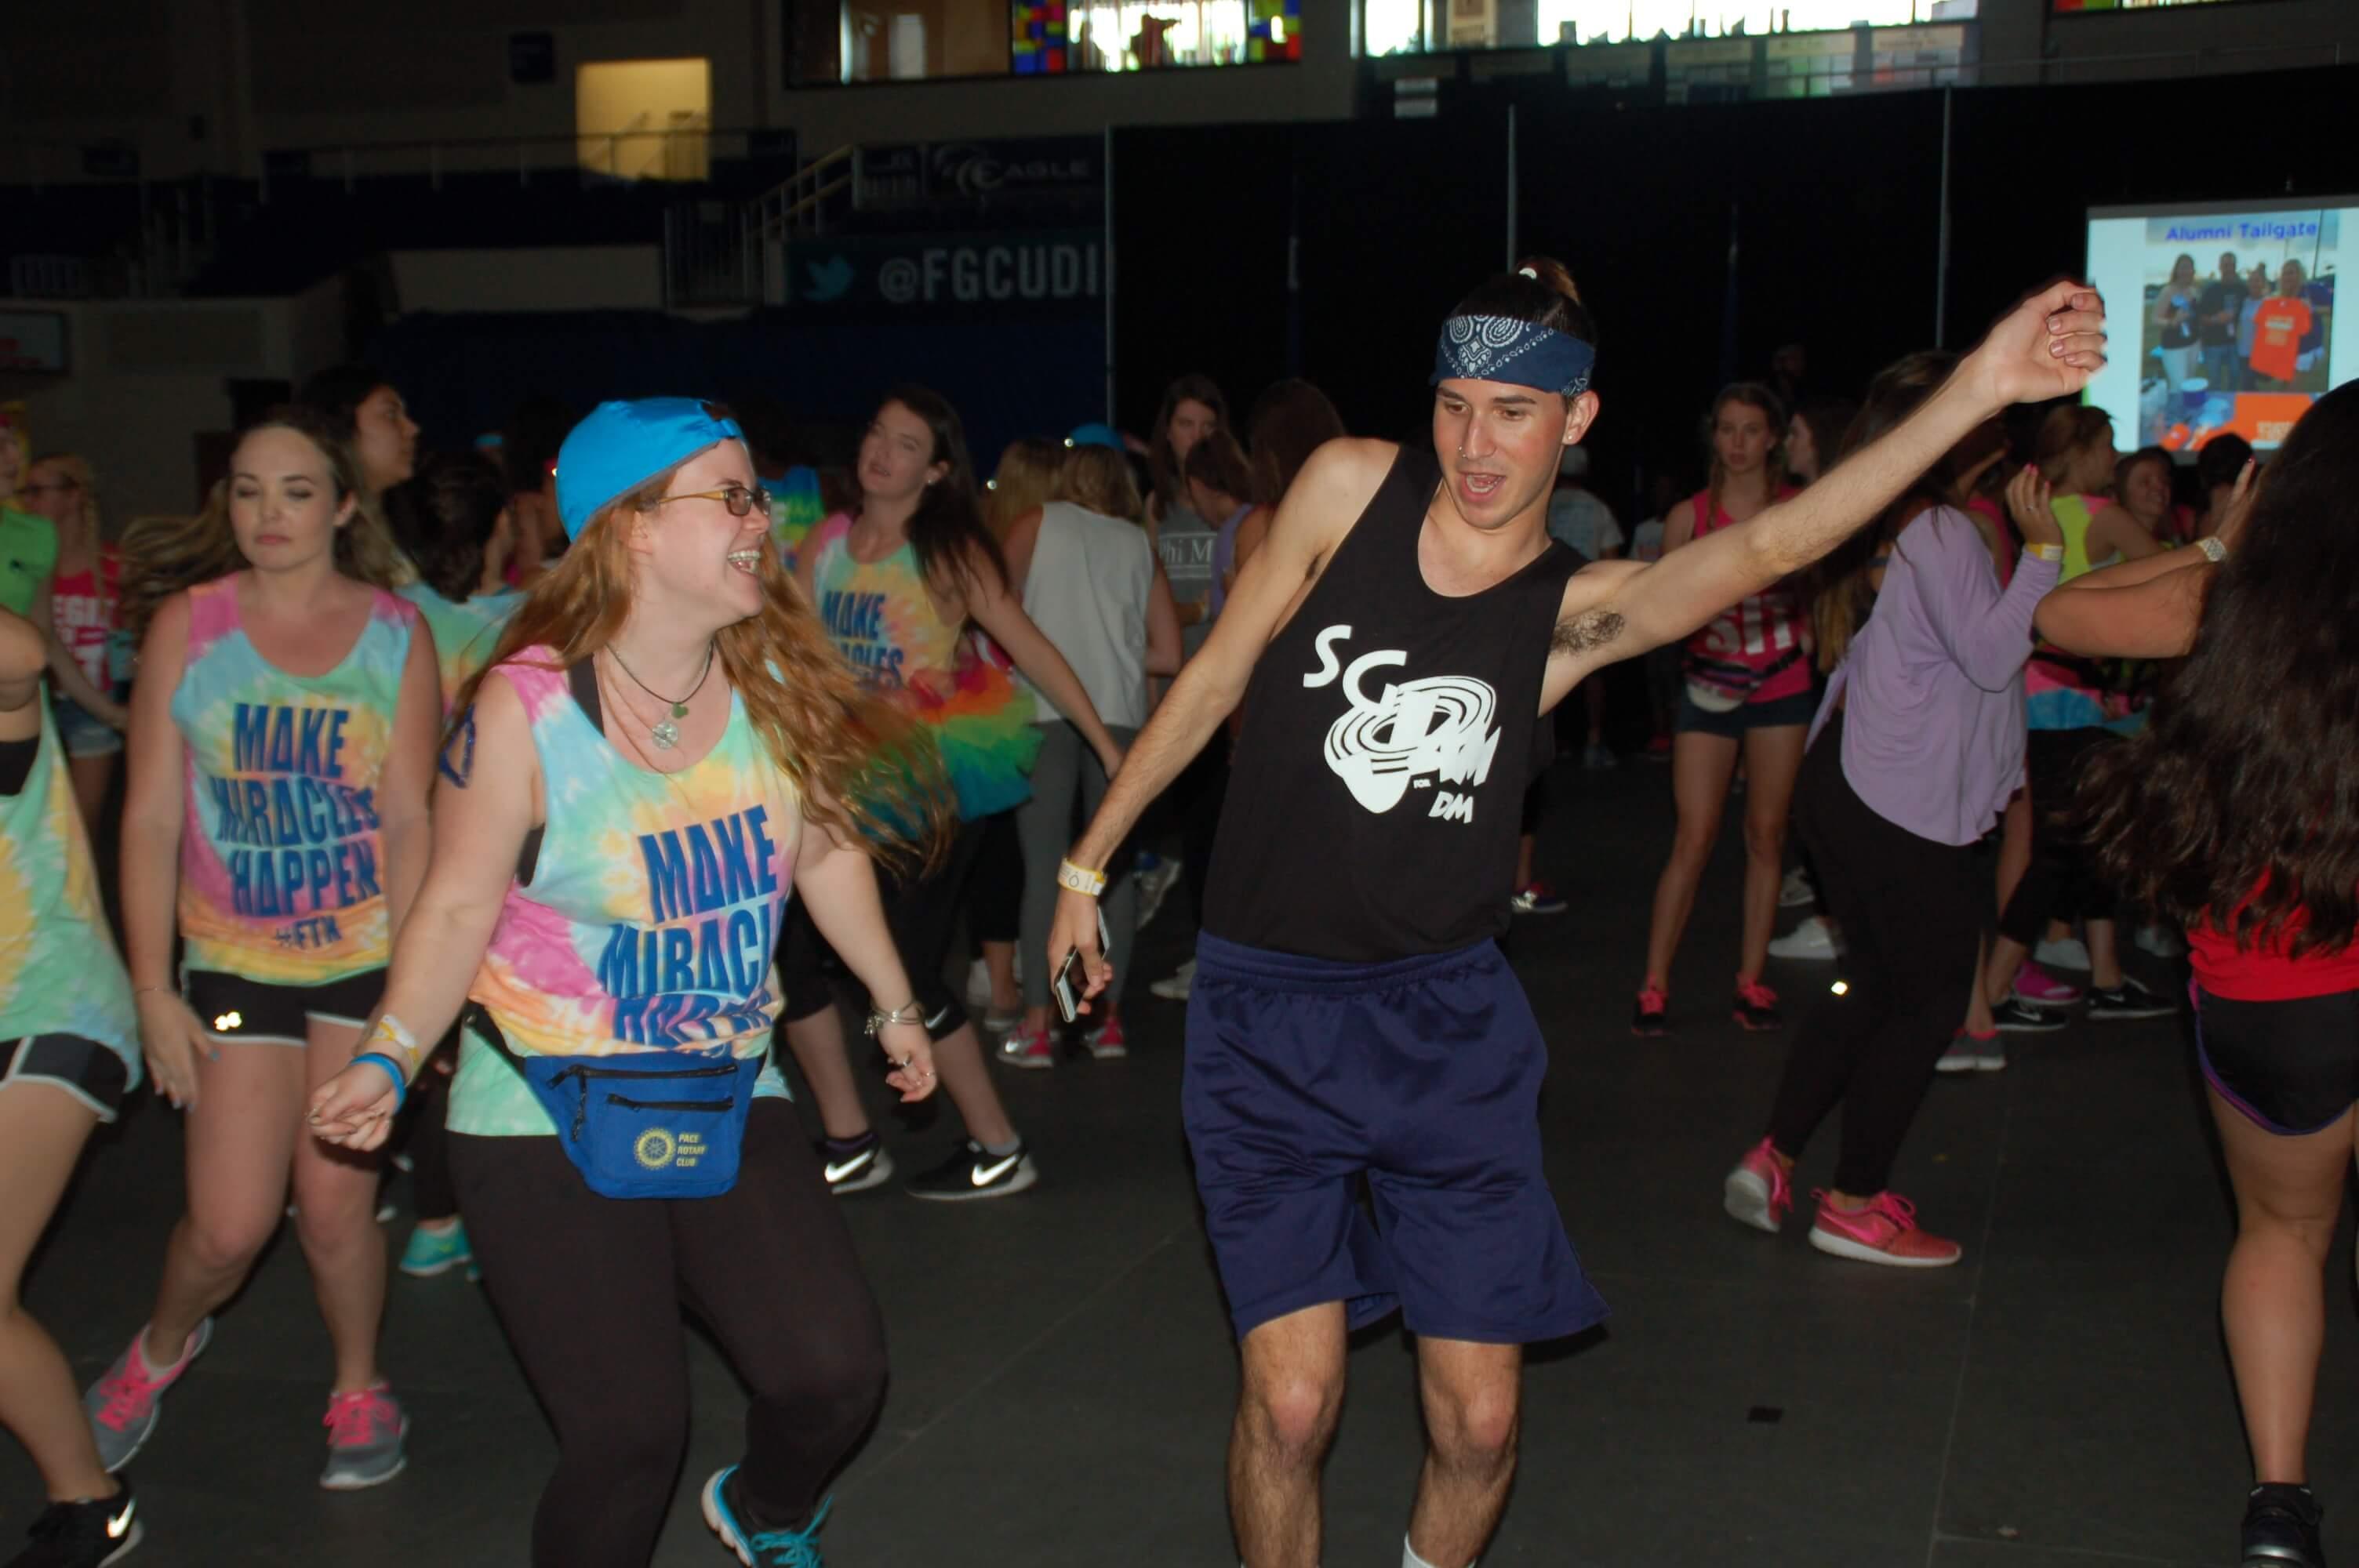 FGCU Dance Marathon raises $52,000 for Children's Miracle Network Hospitals